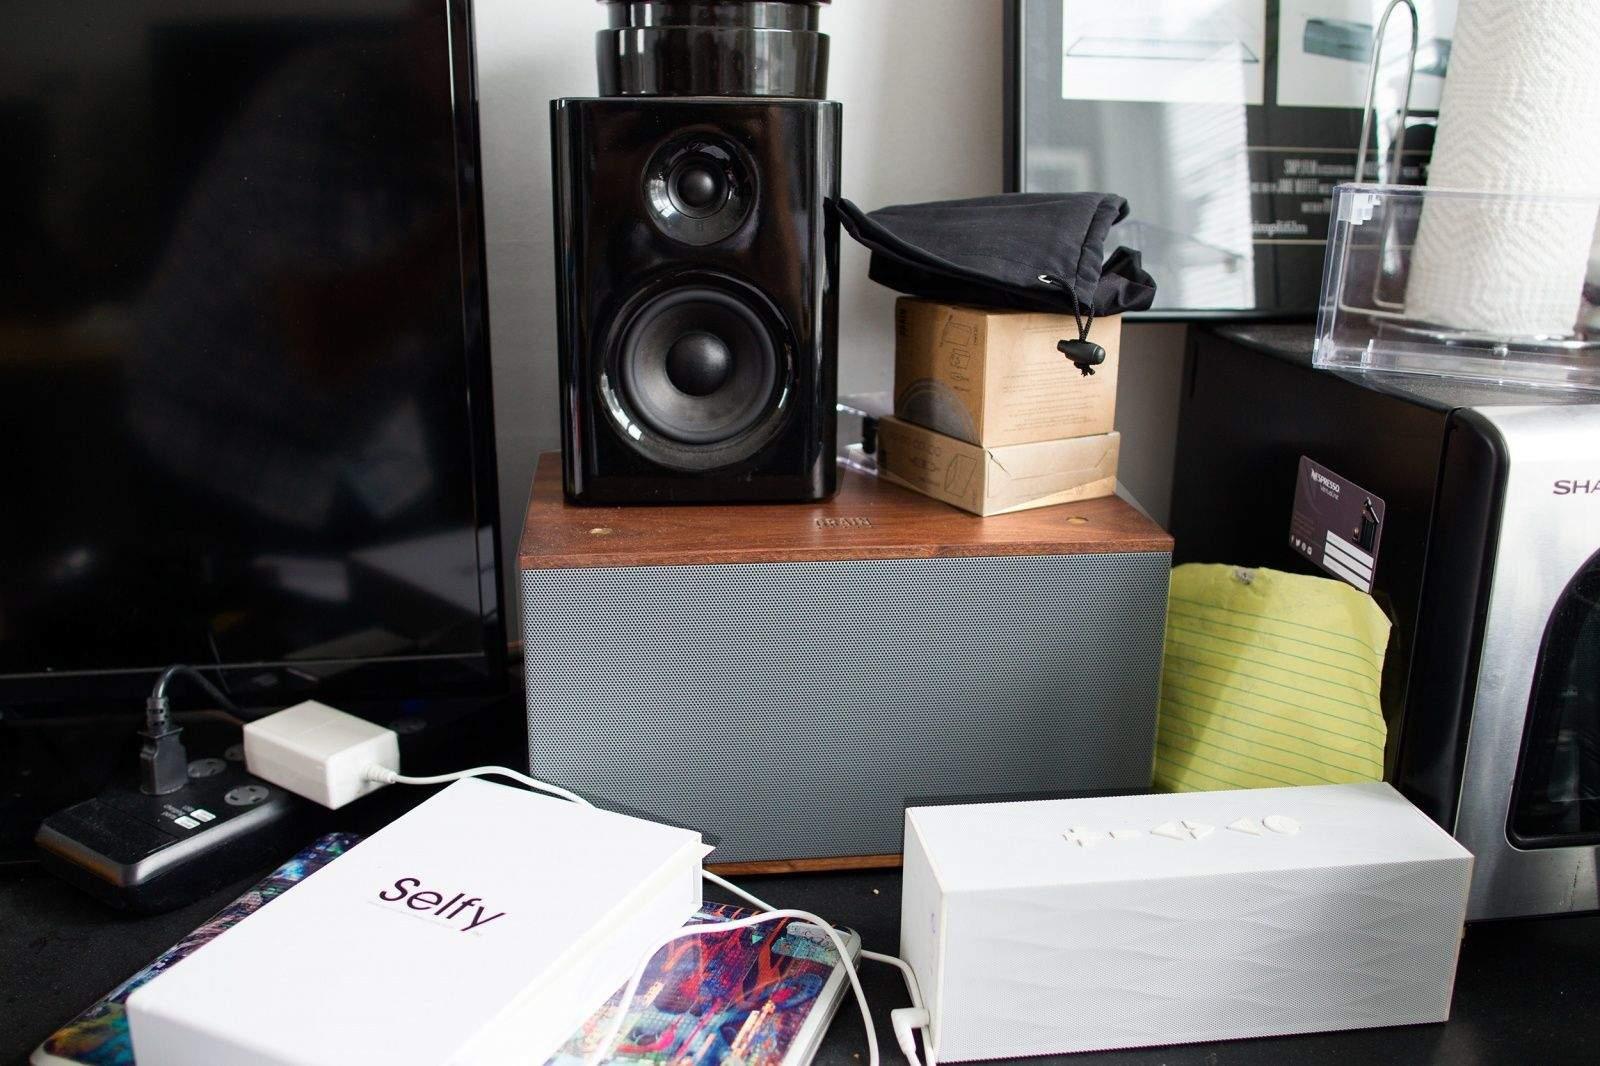 One Of Grain Audios Wooden Bookshelf Speakers Rocks The Cult Mac Offices